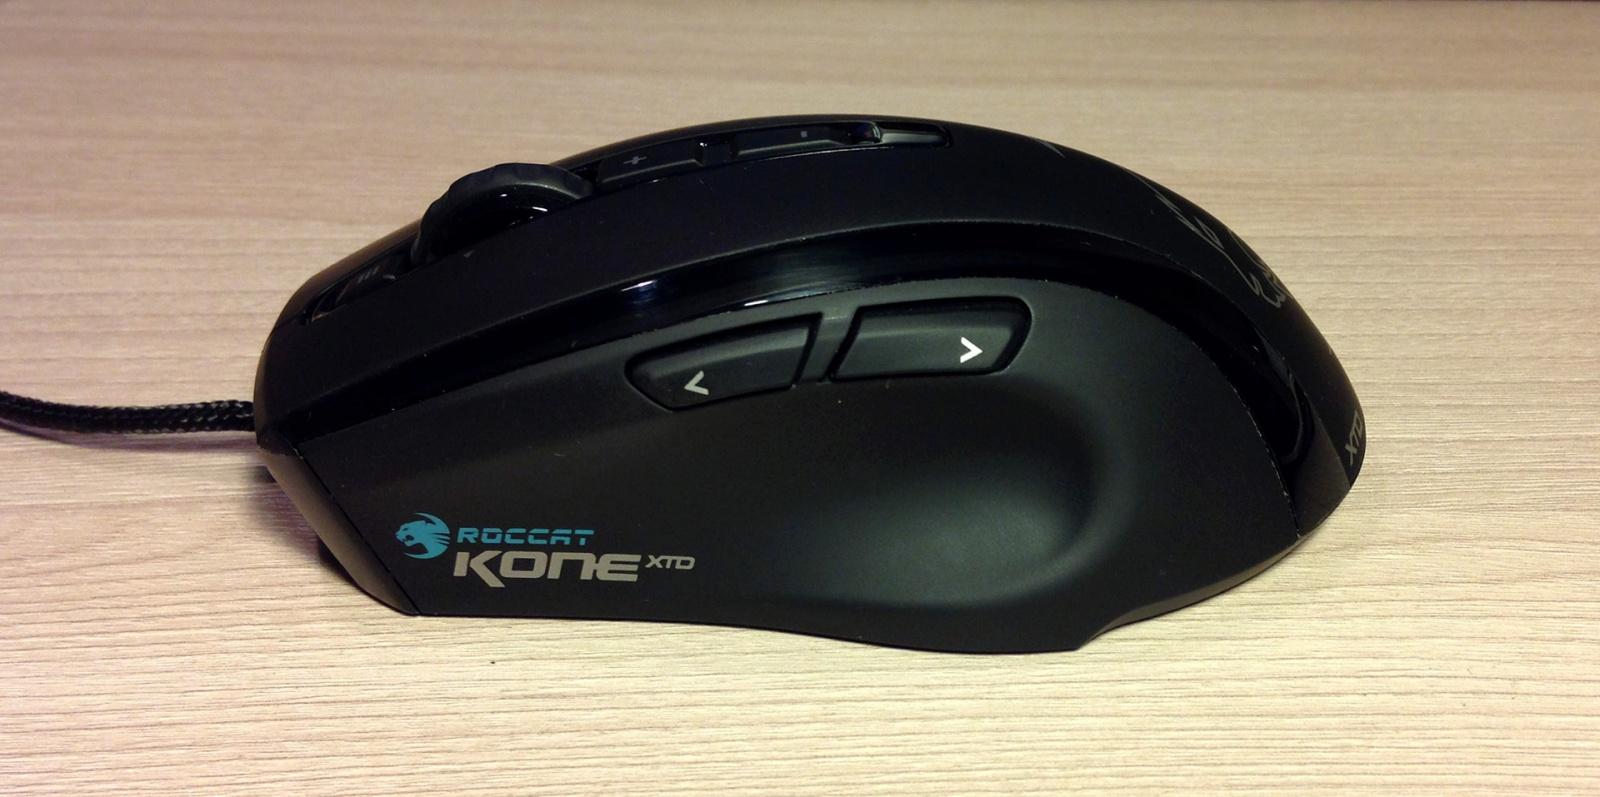 Мышки топ-сегмента – Roccat Kone XTD и Roccat Kone XTD Optical - 10